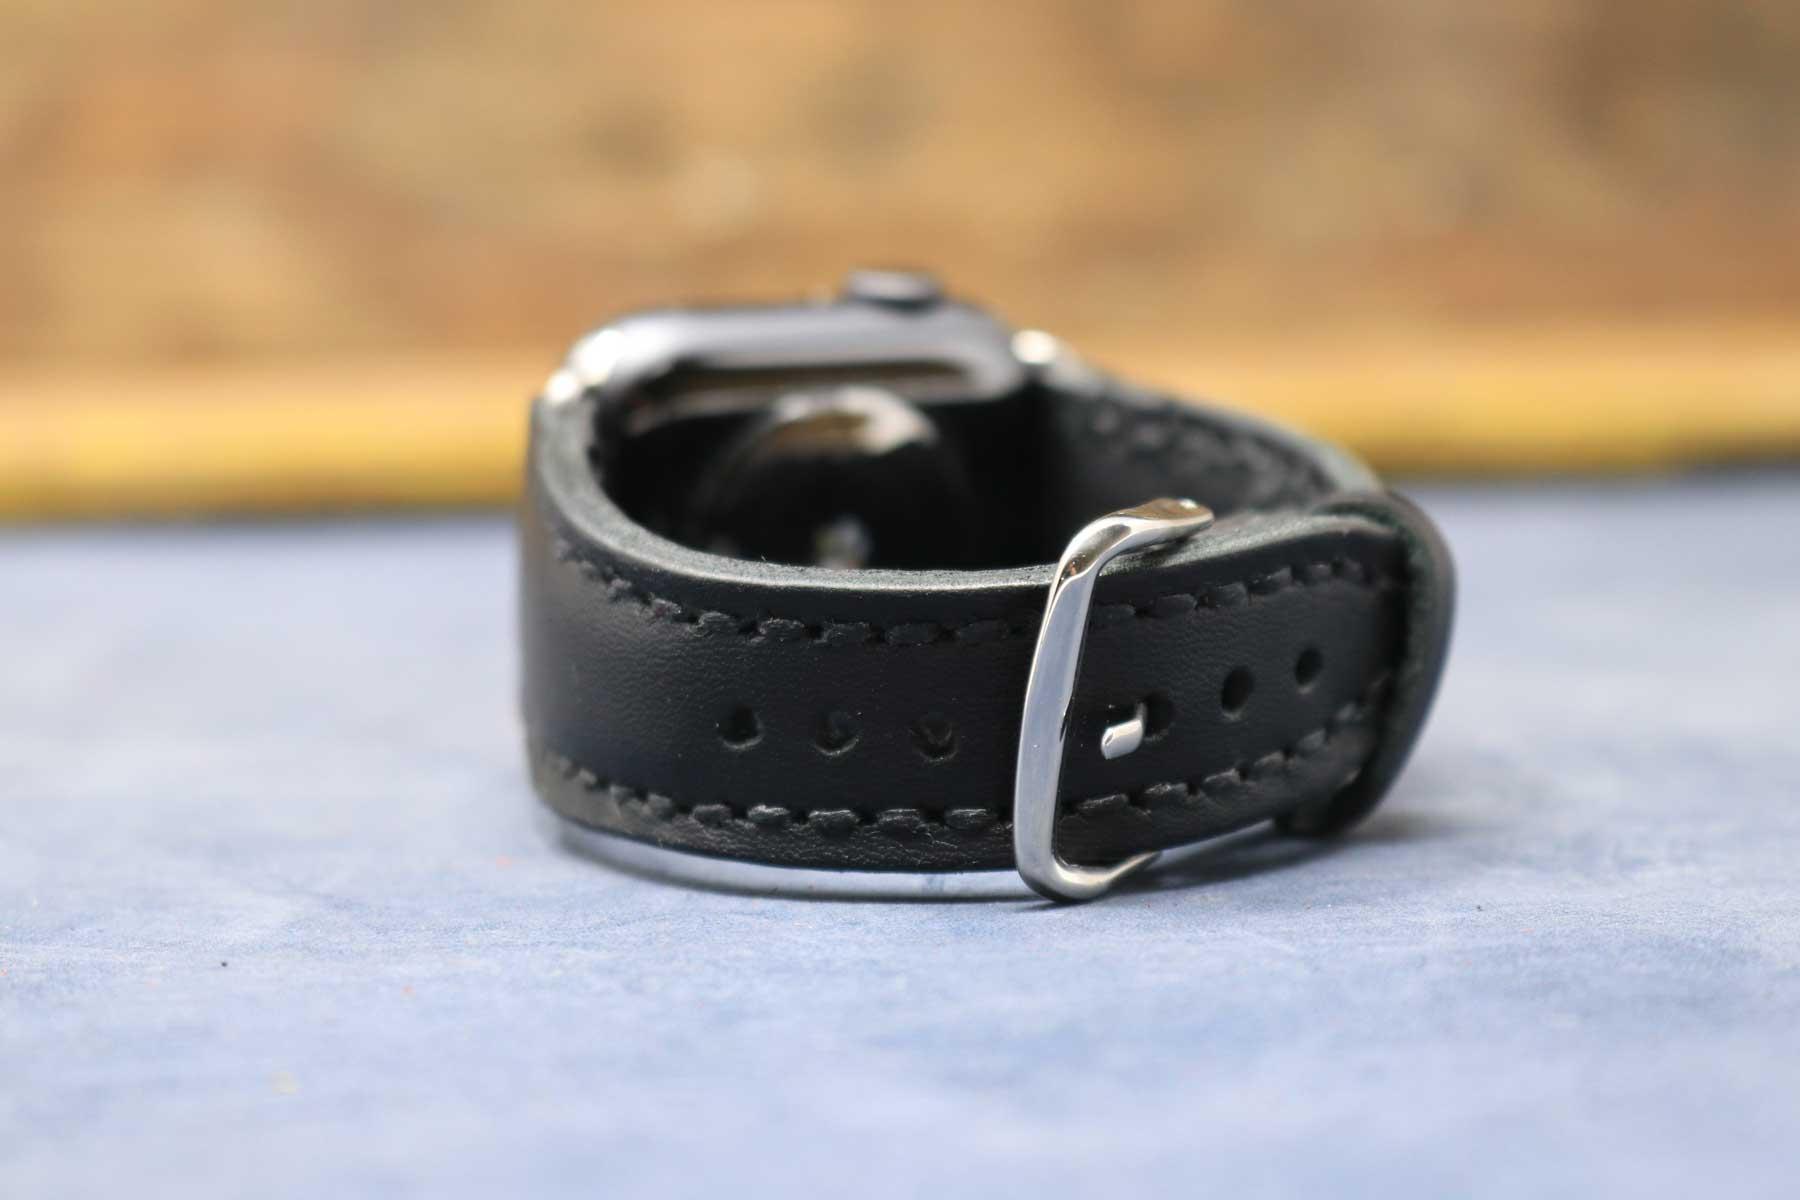 01-Watch-Strap-Black-Modern-02.jpg